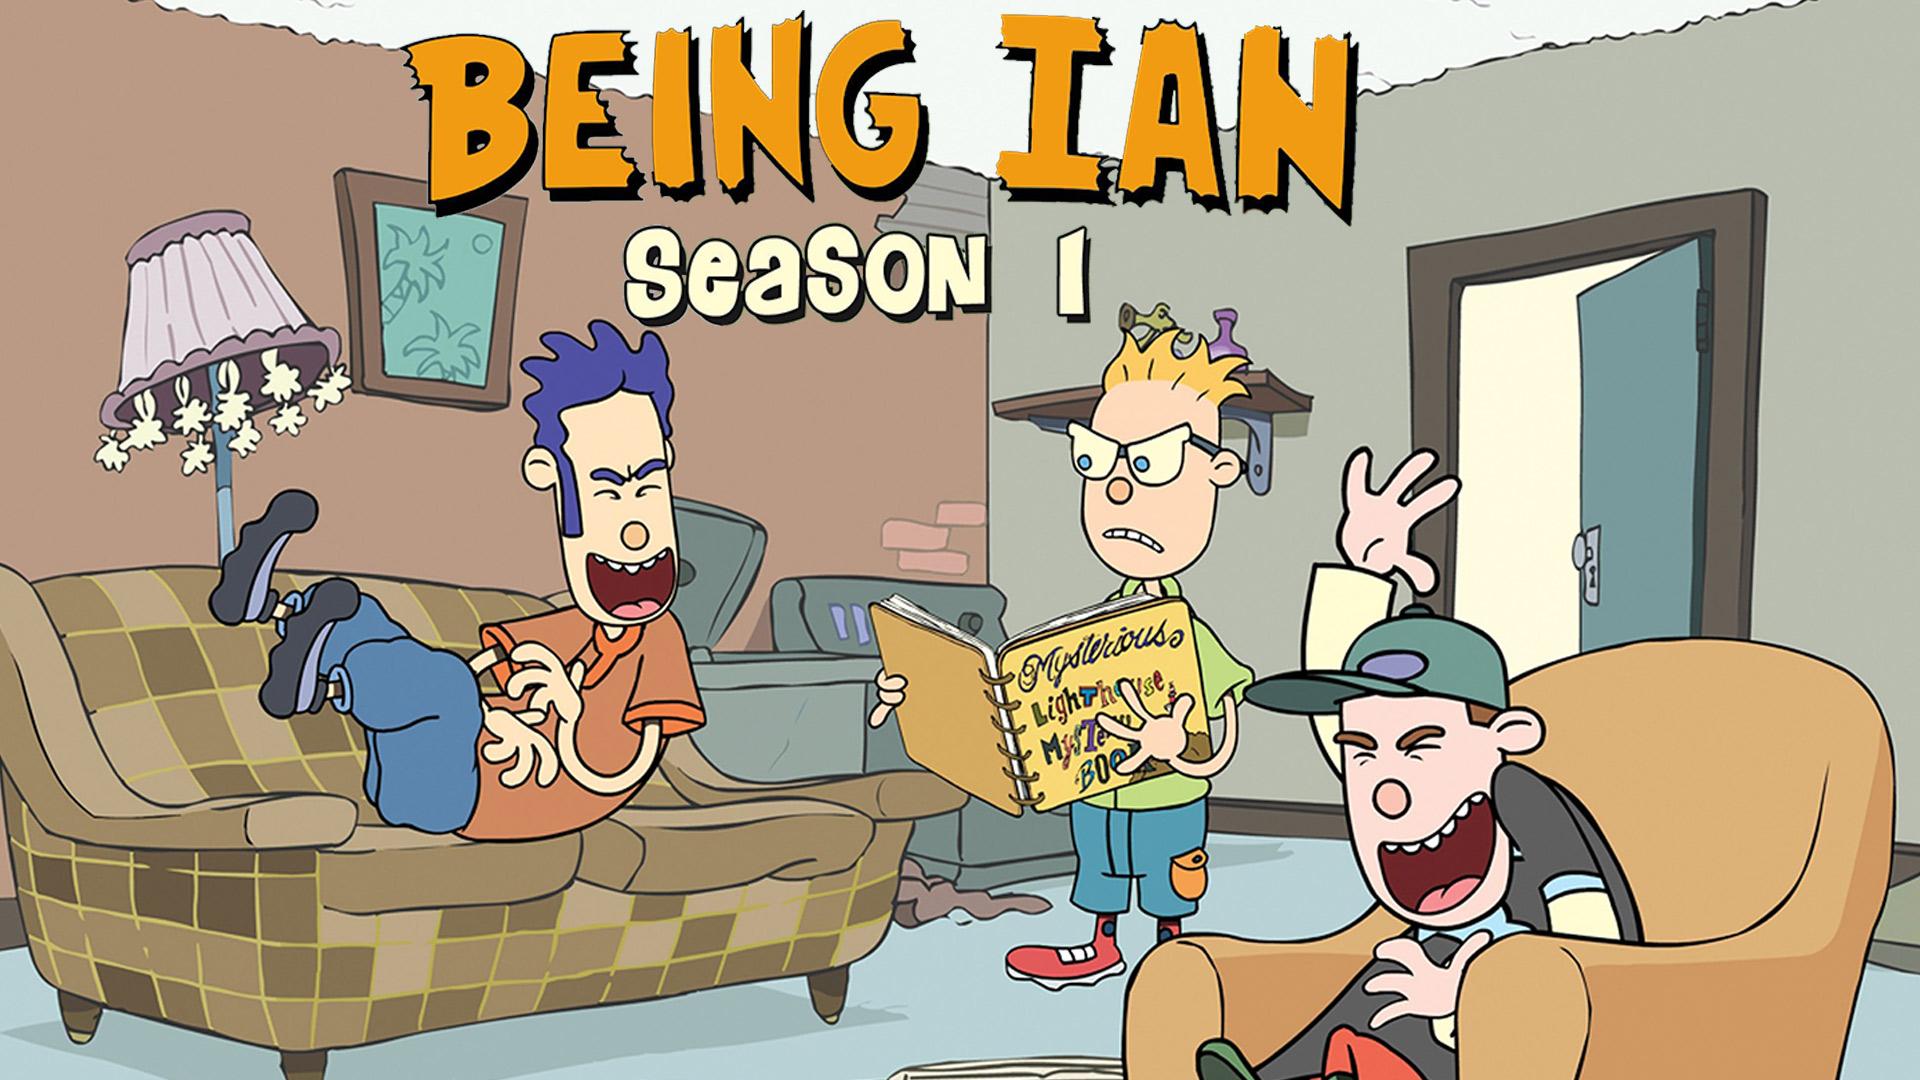 Being Ian Season 1